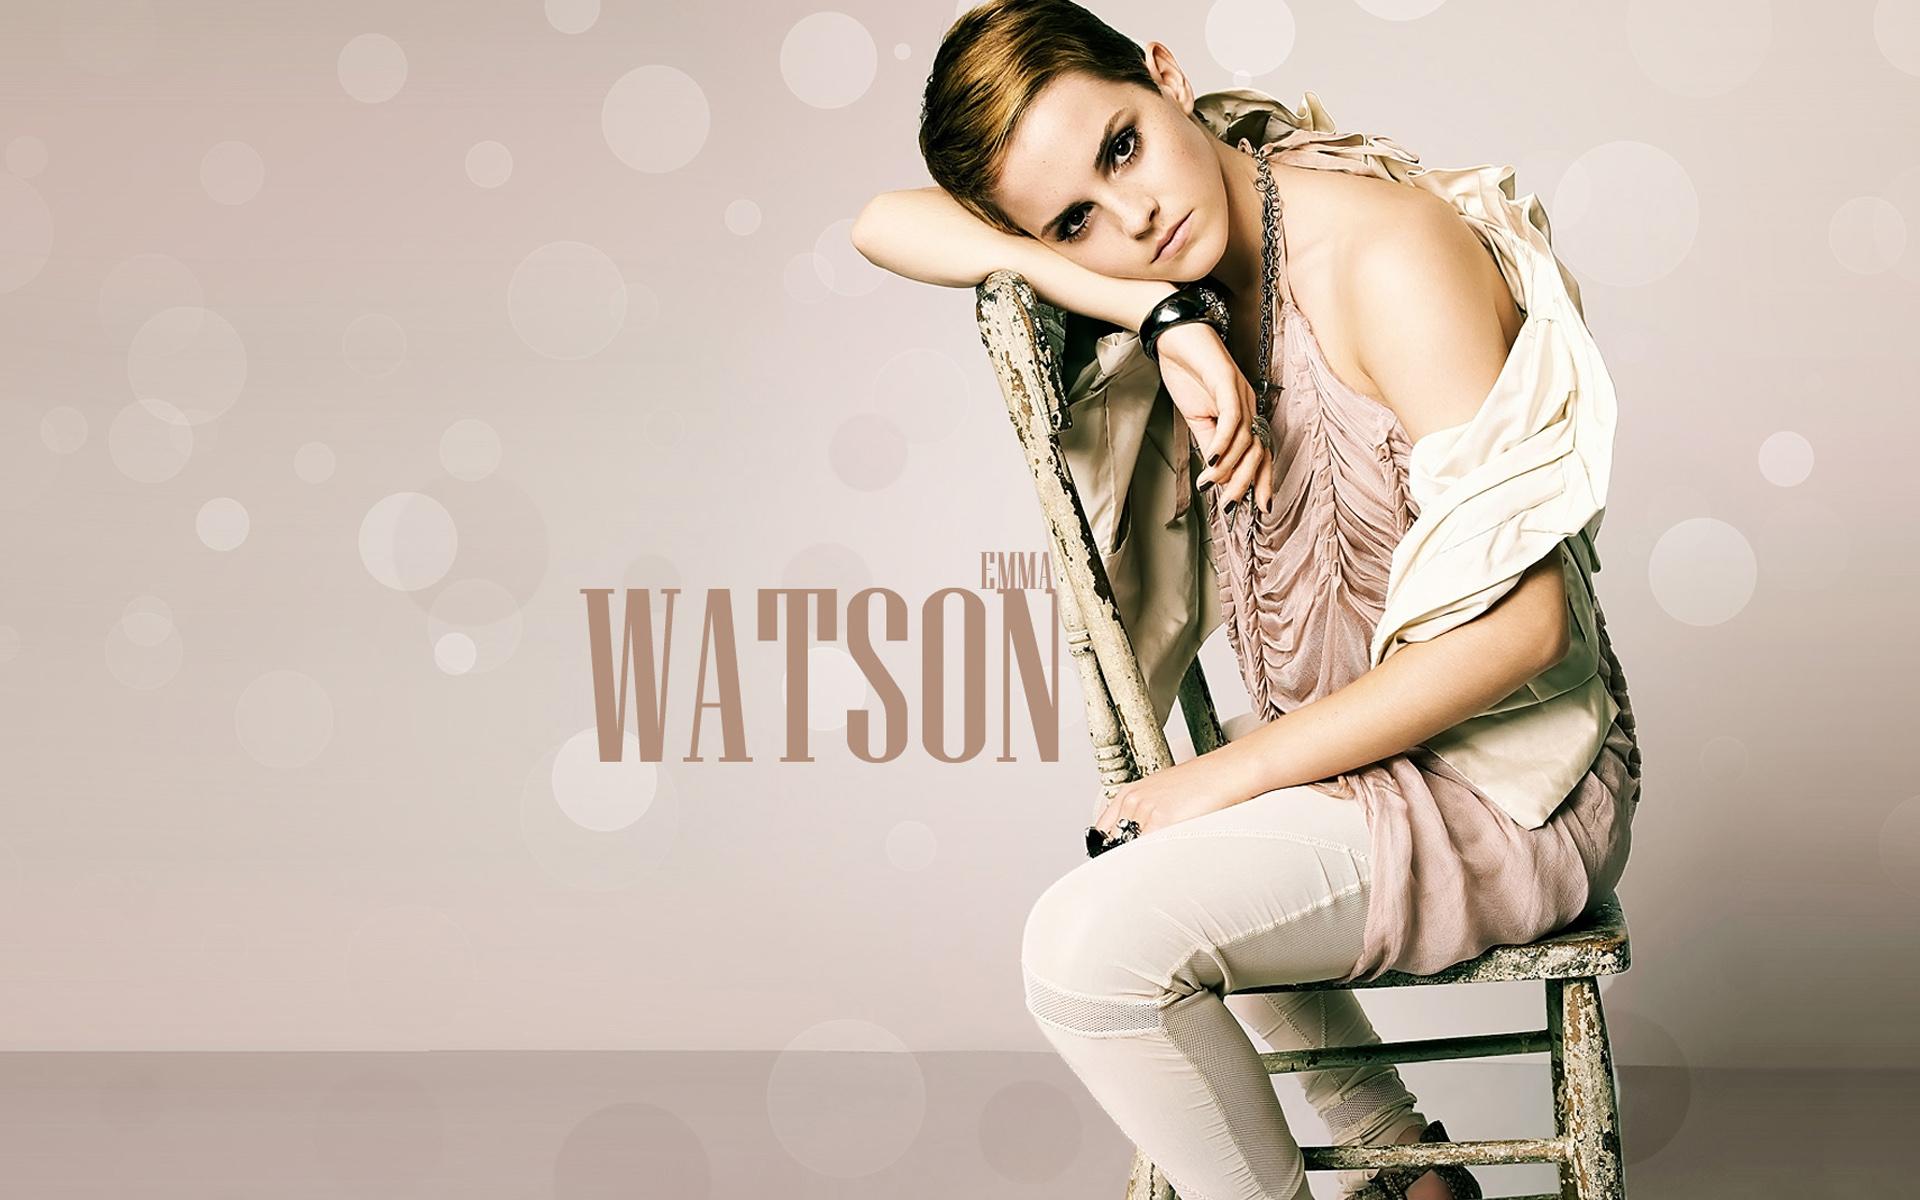 Emma Watson 289 wallpaper